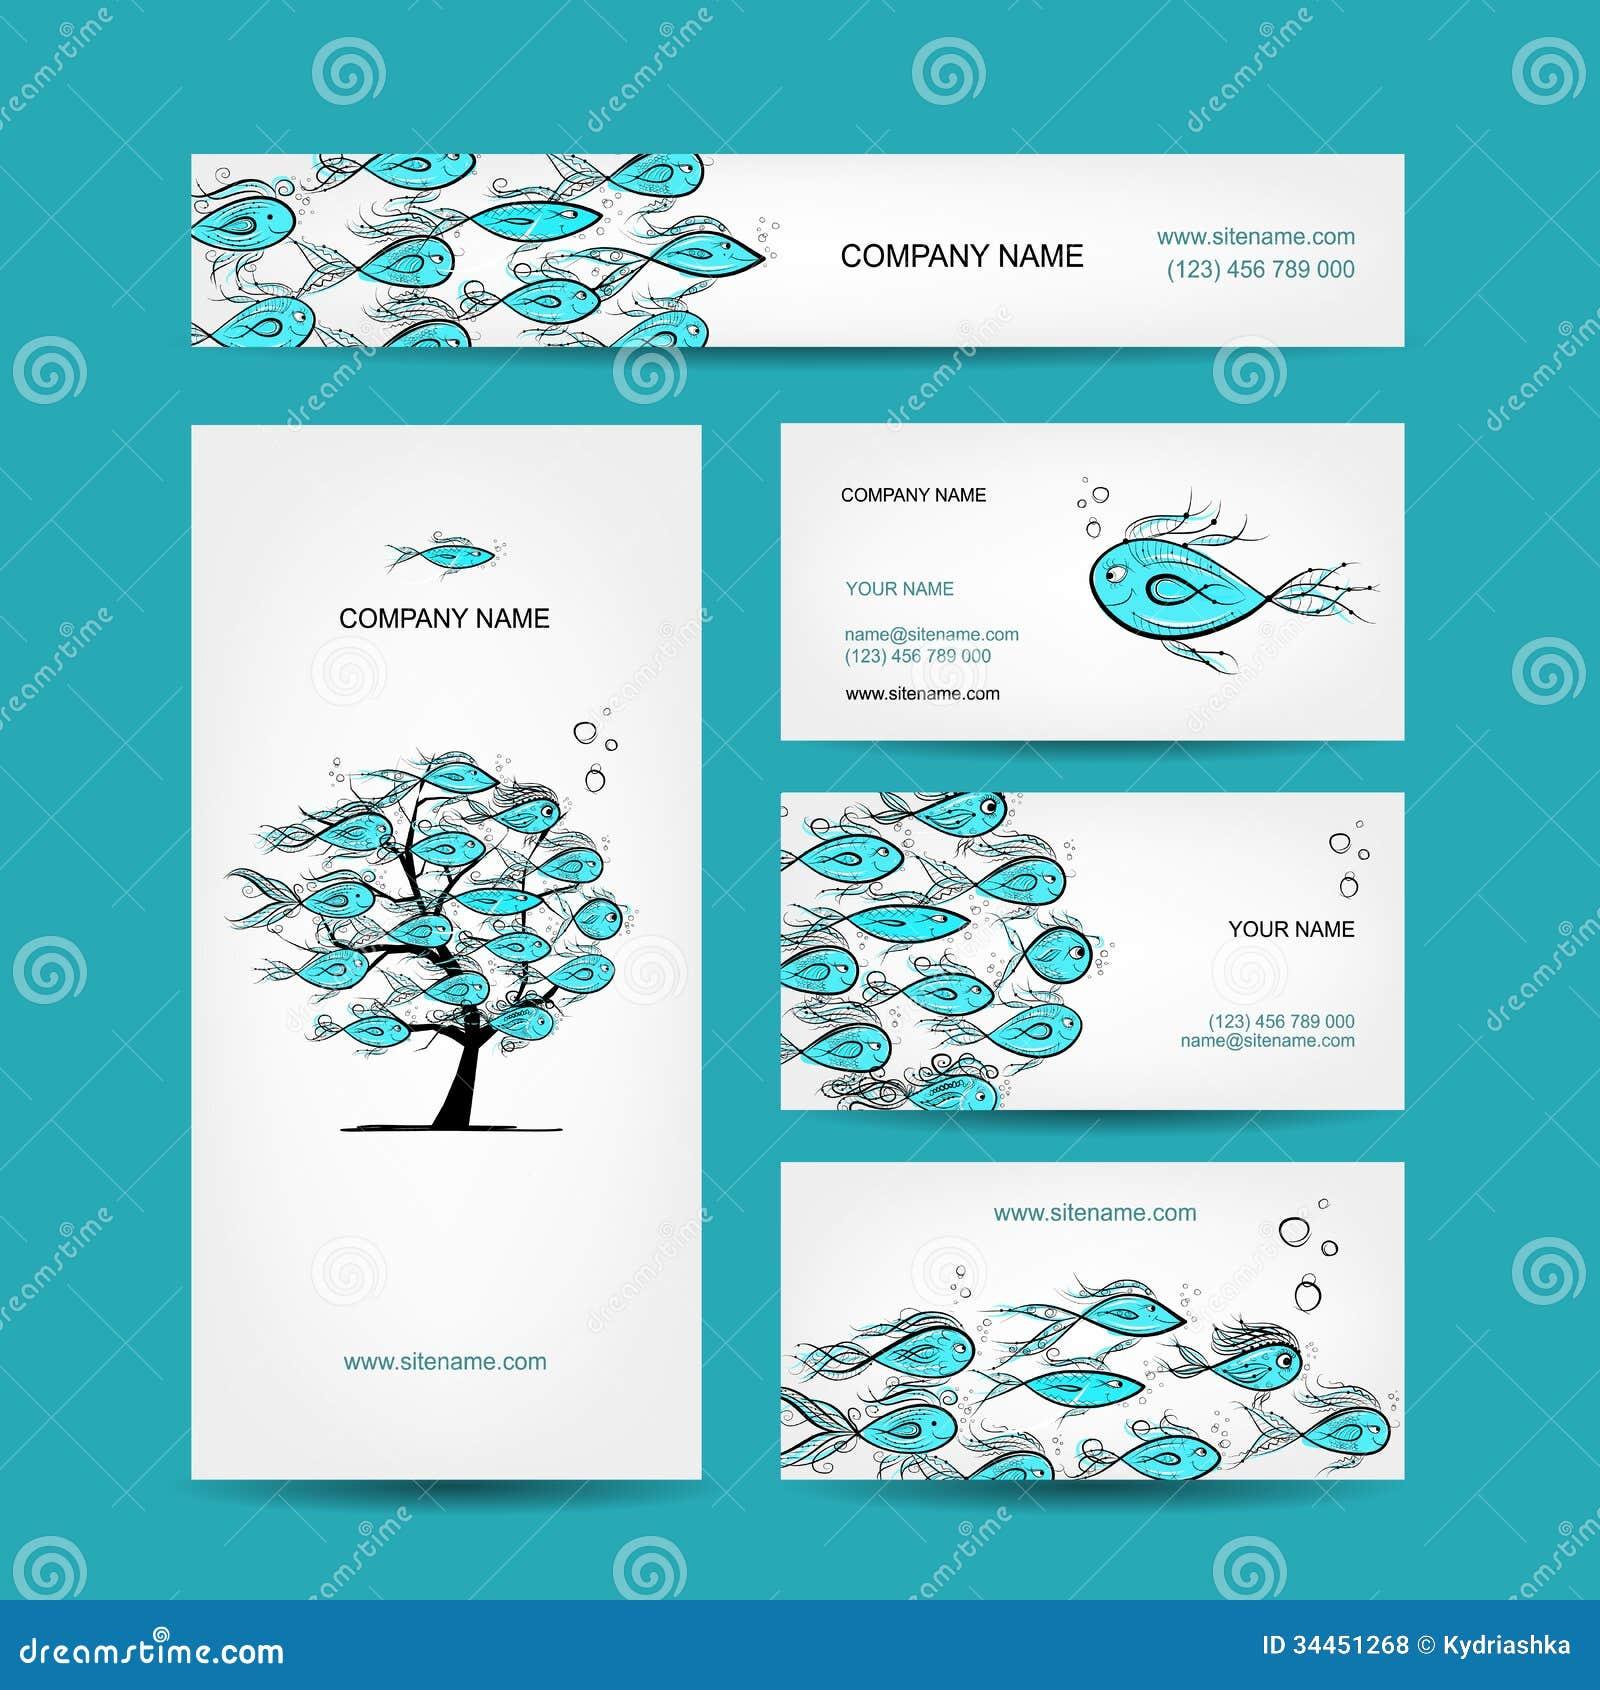 Business cards design marine theme royalty free stock photos royalty free stock photo download business cards design marine magicingreecefo Gallery